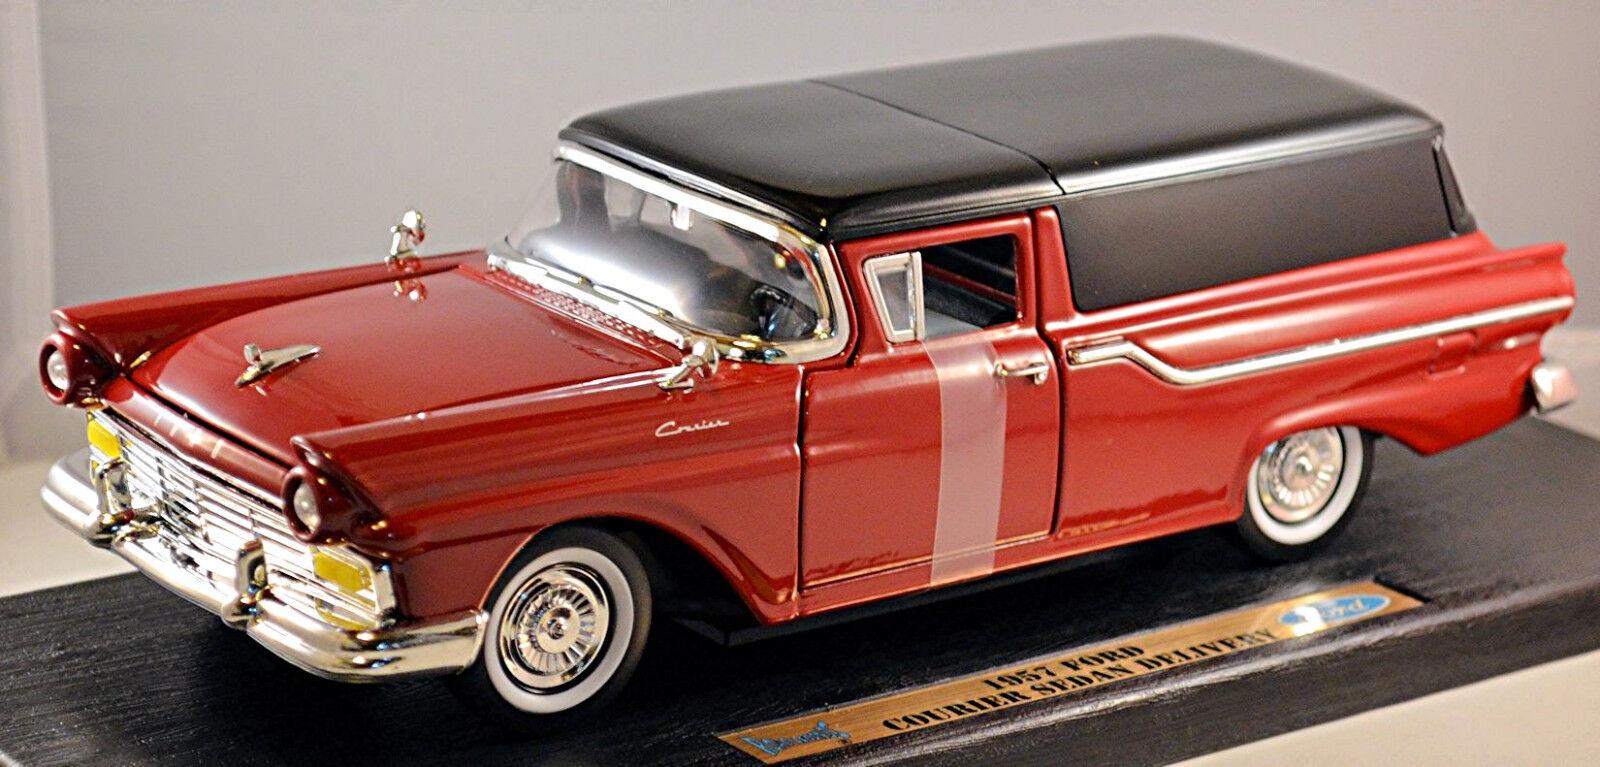 Ford Courier Sedan Delivery 1957 rot rot 1 18 Yat Ming  | Verrückter Preis, Birmingham